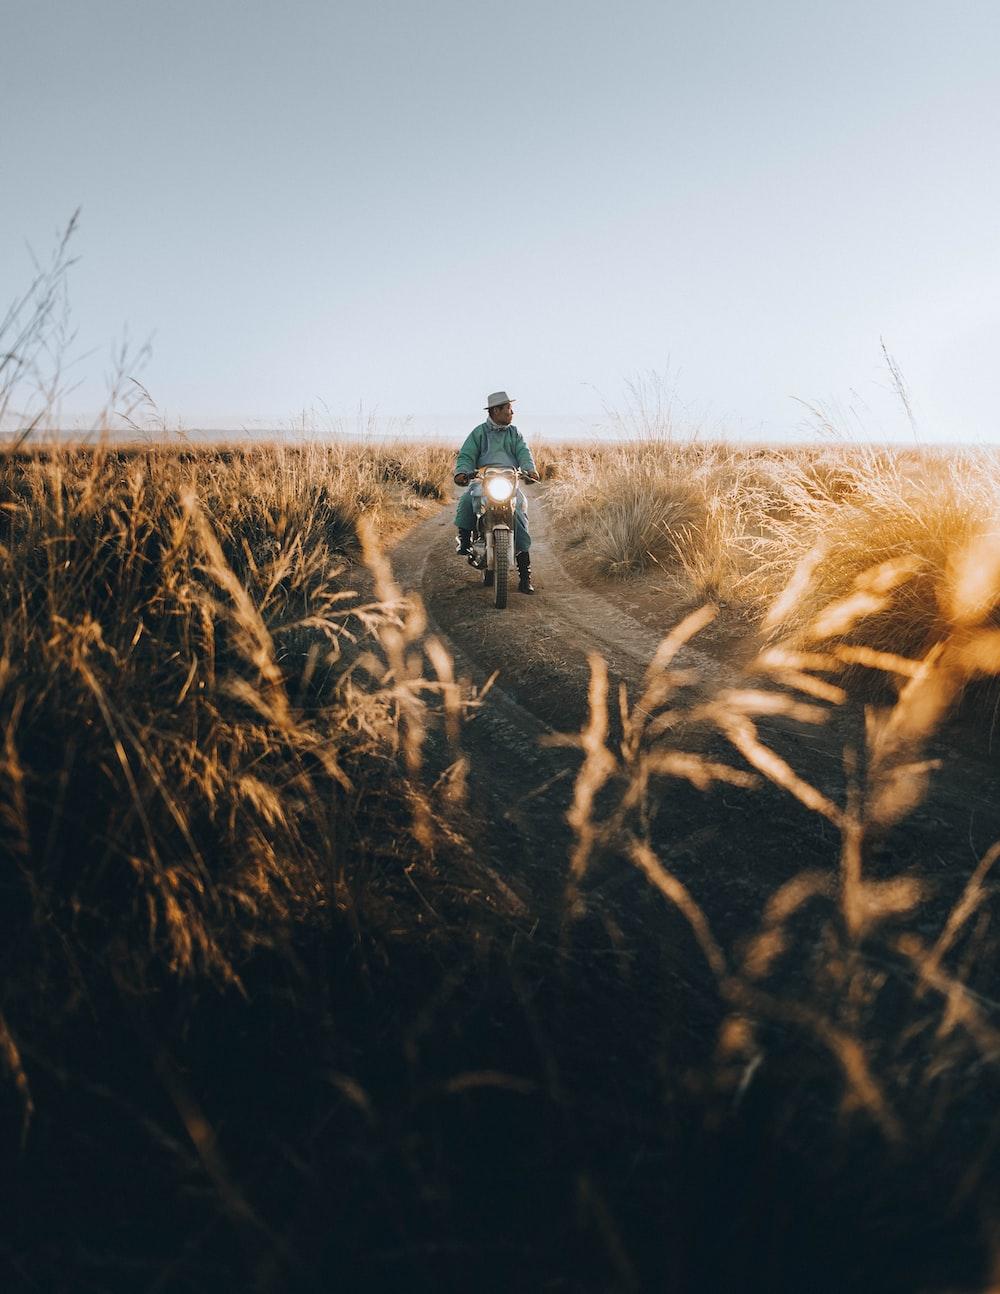 man riding motorcycle during day